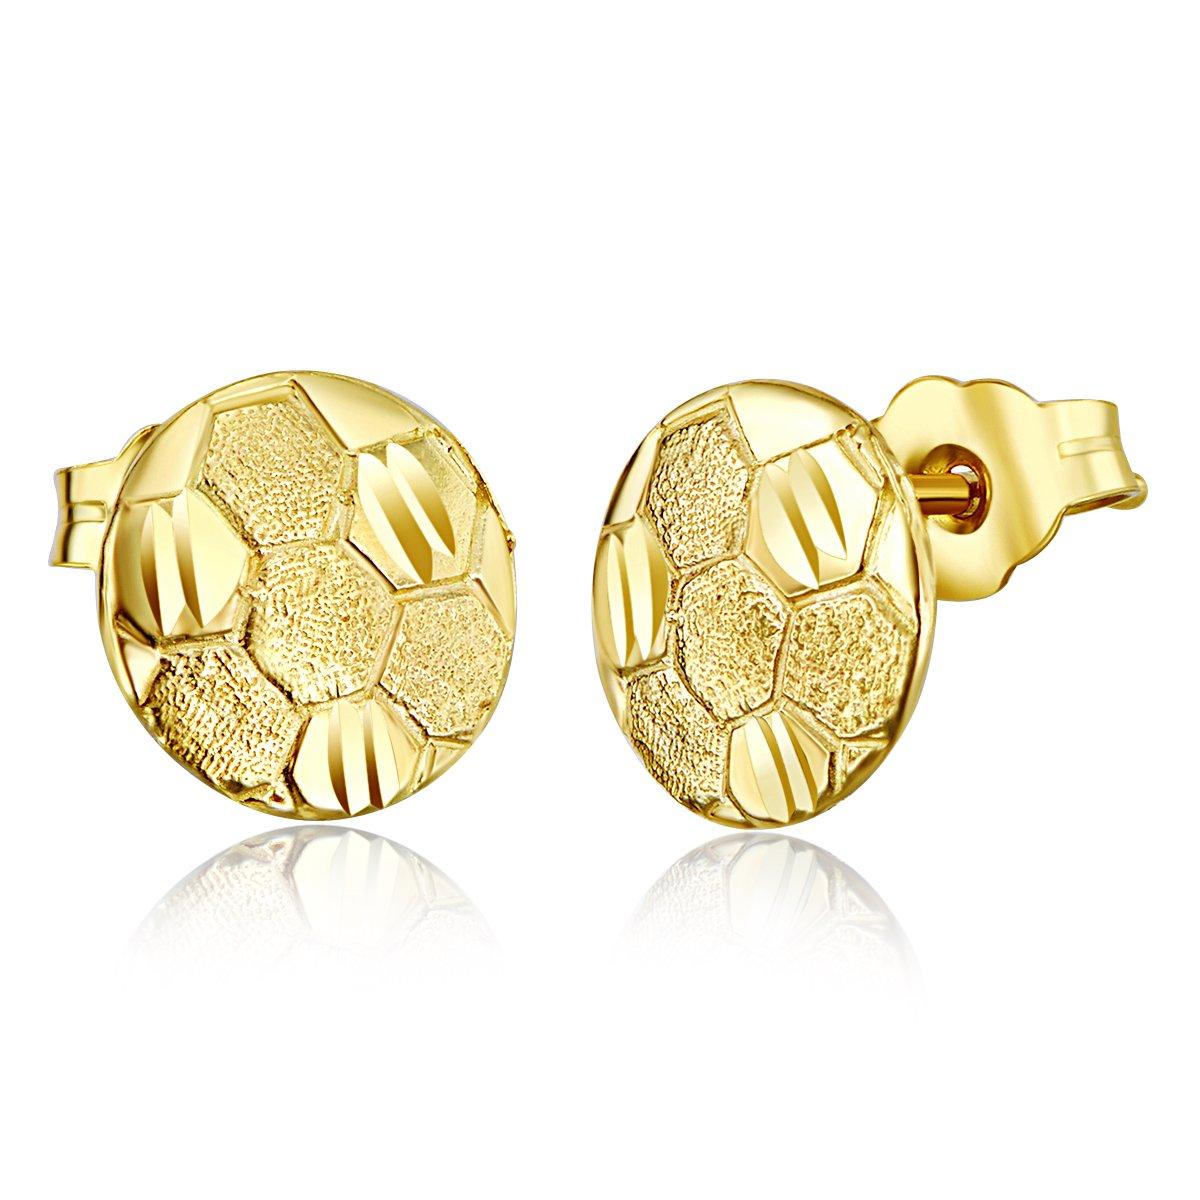 8mm Diameter Wellingsale Ladies 14k Yellow Gold Polished Soccer Ball Stud Earrings